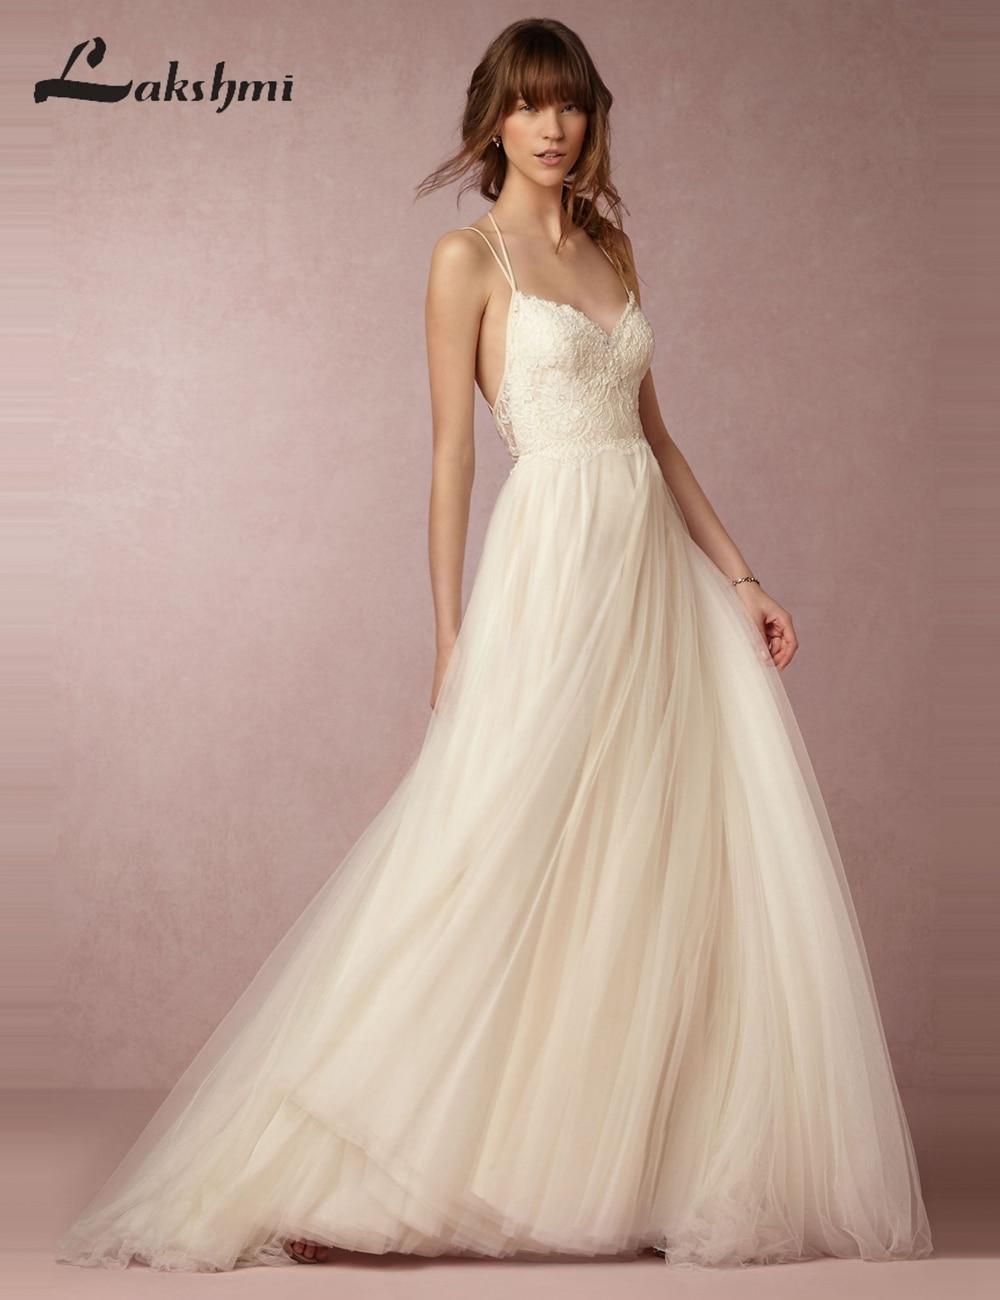 Small Crop Of Vintage Wedding Dress